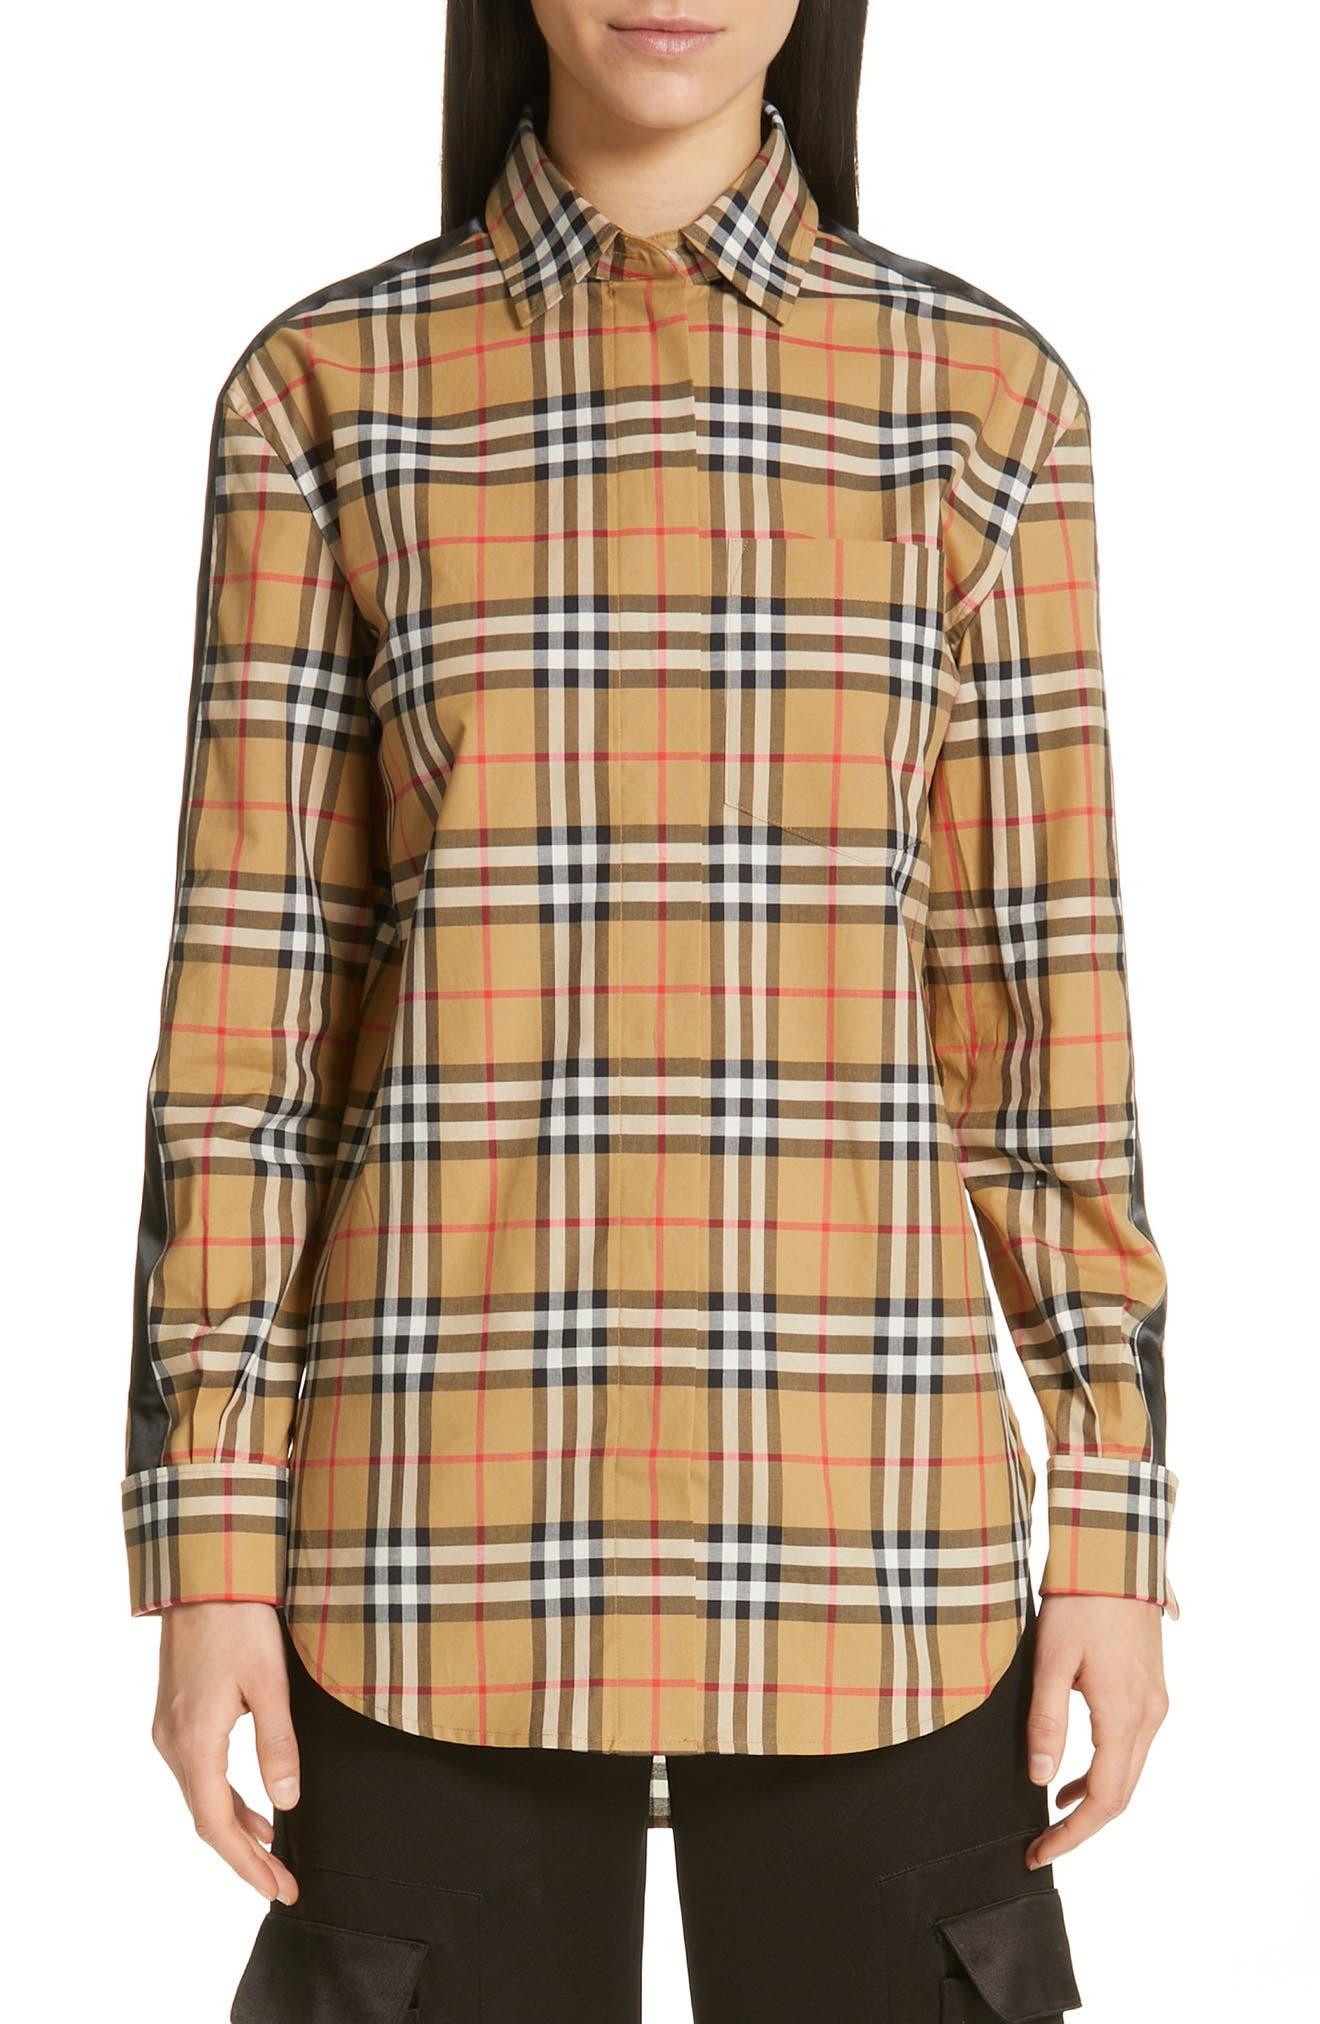 BURBERRY Saoirse Vintage Check Cotton Shirt, Main, color, ANTIQUE YELLOW CHECK